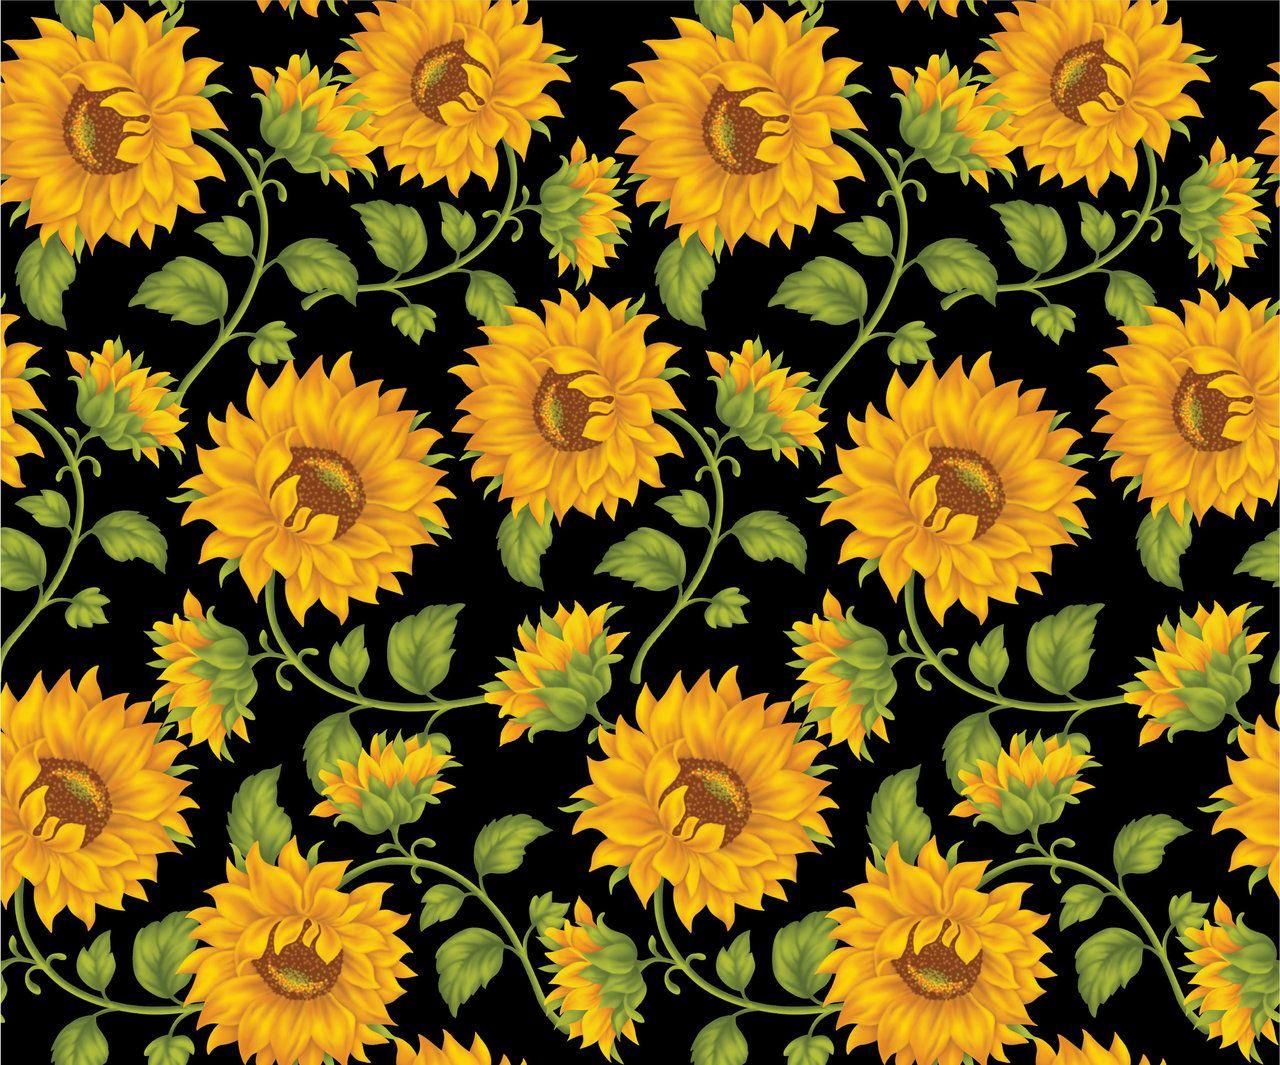 yellow aesthetic wallpaper 20072002190036